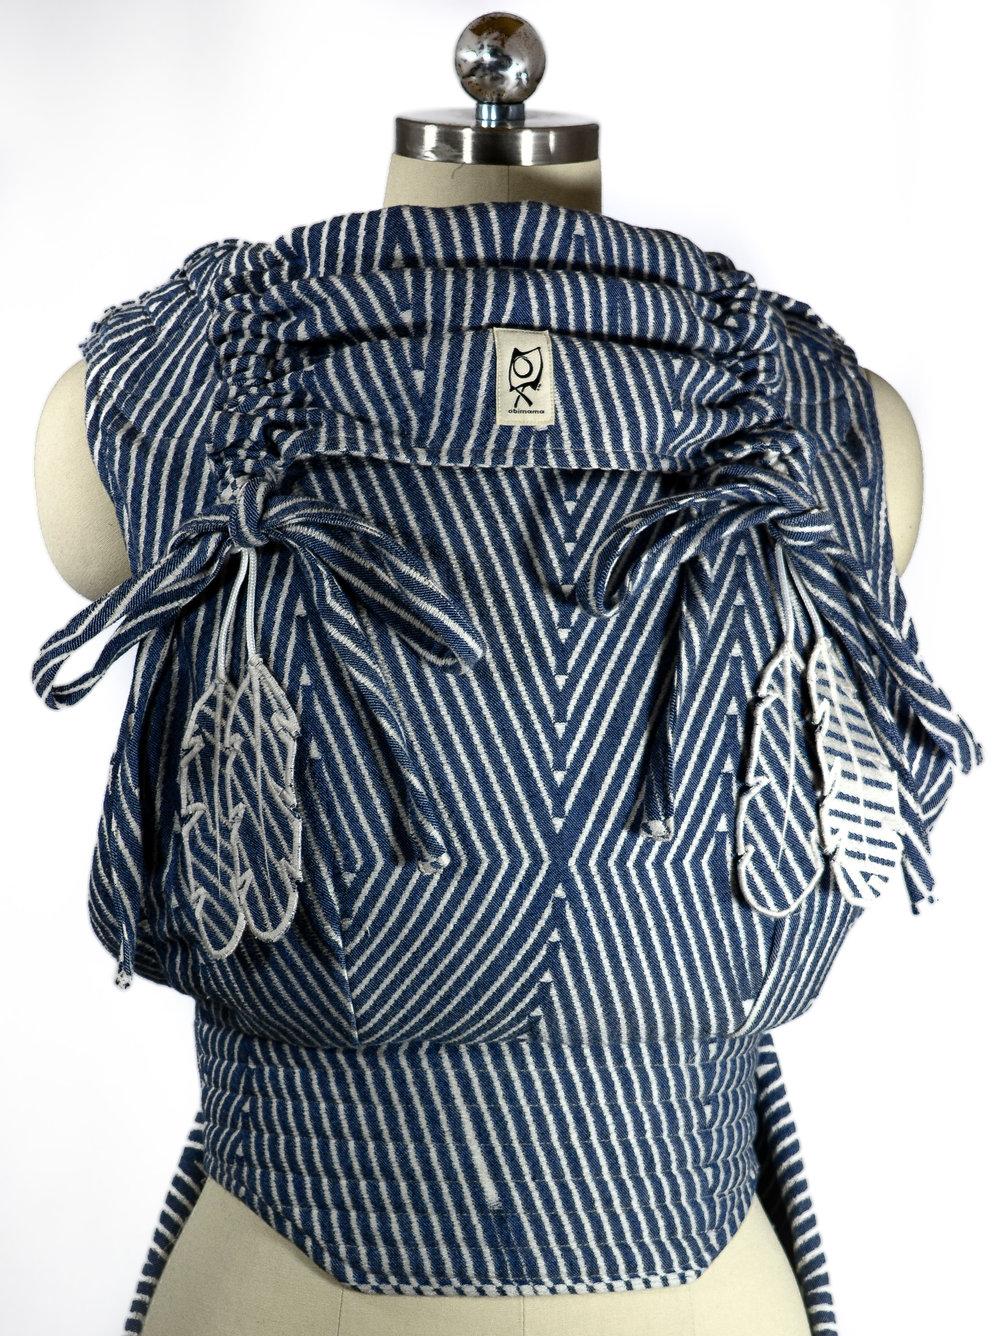 ObiMama Wrap Conversion Mei Tai Pavo Textiles' navy Perigee